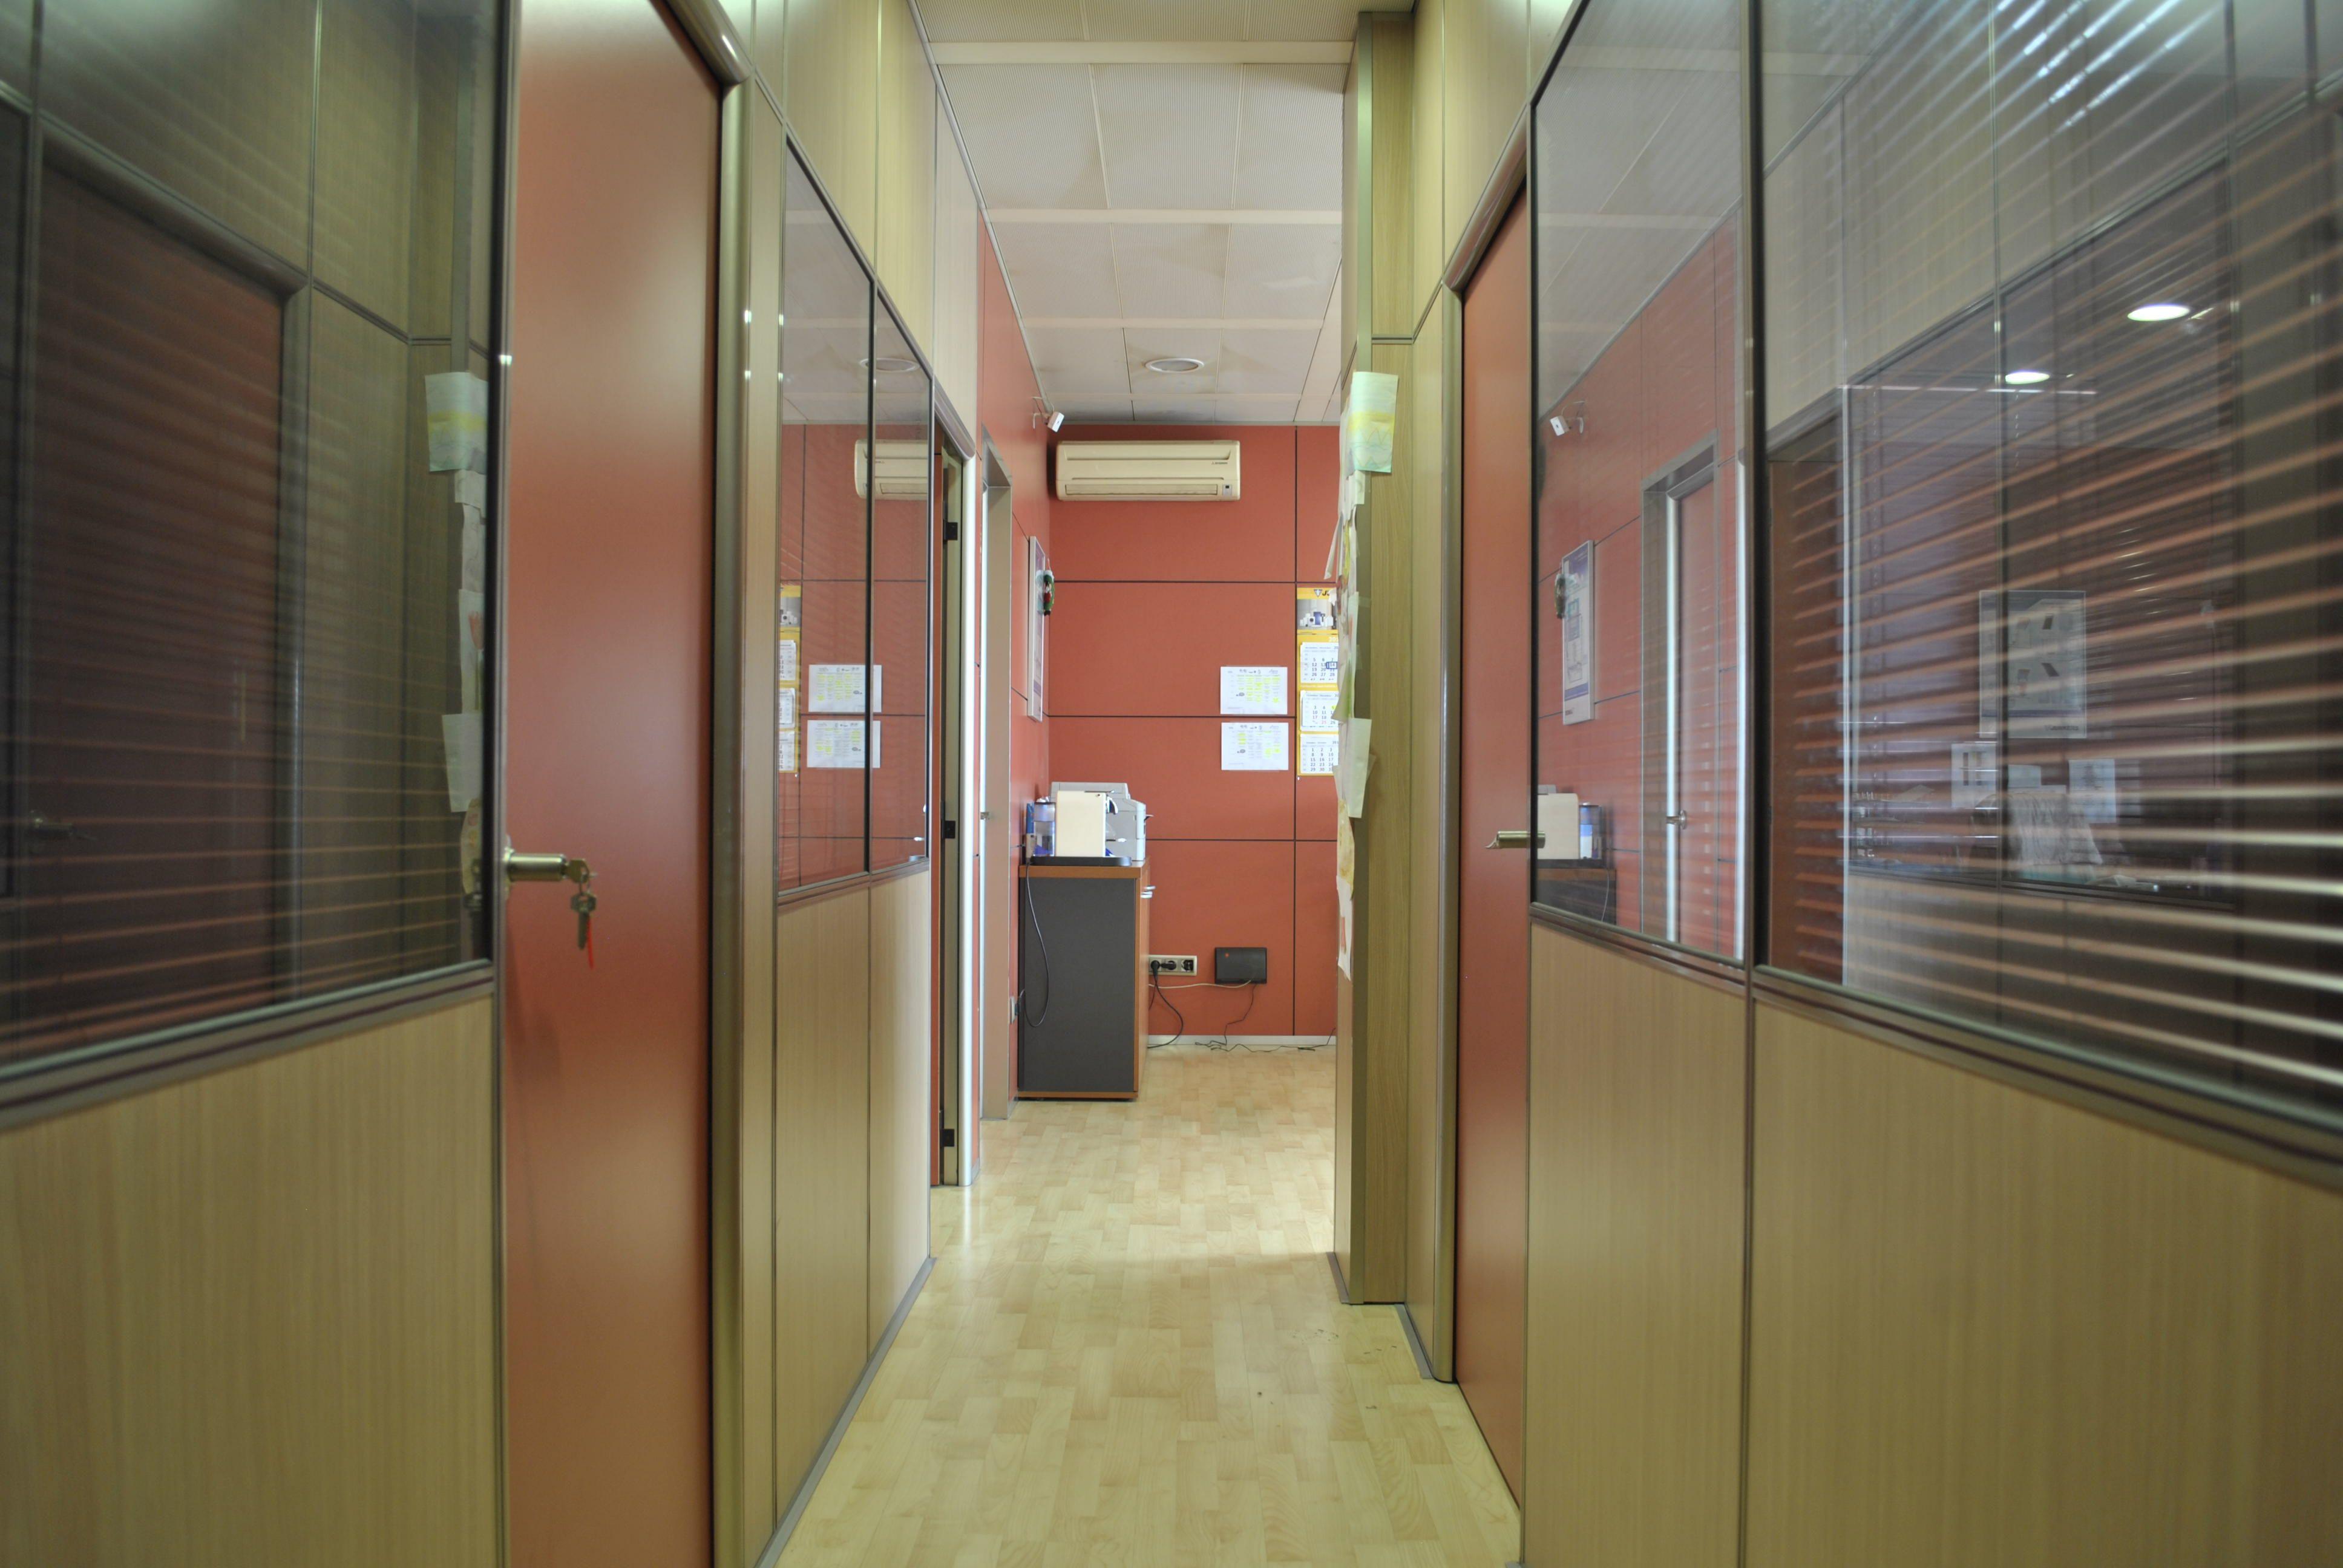 Oficinas S.A.T Servei